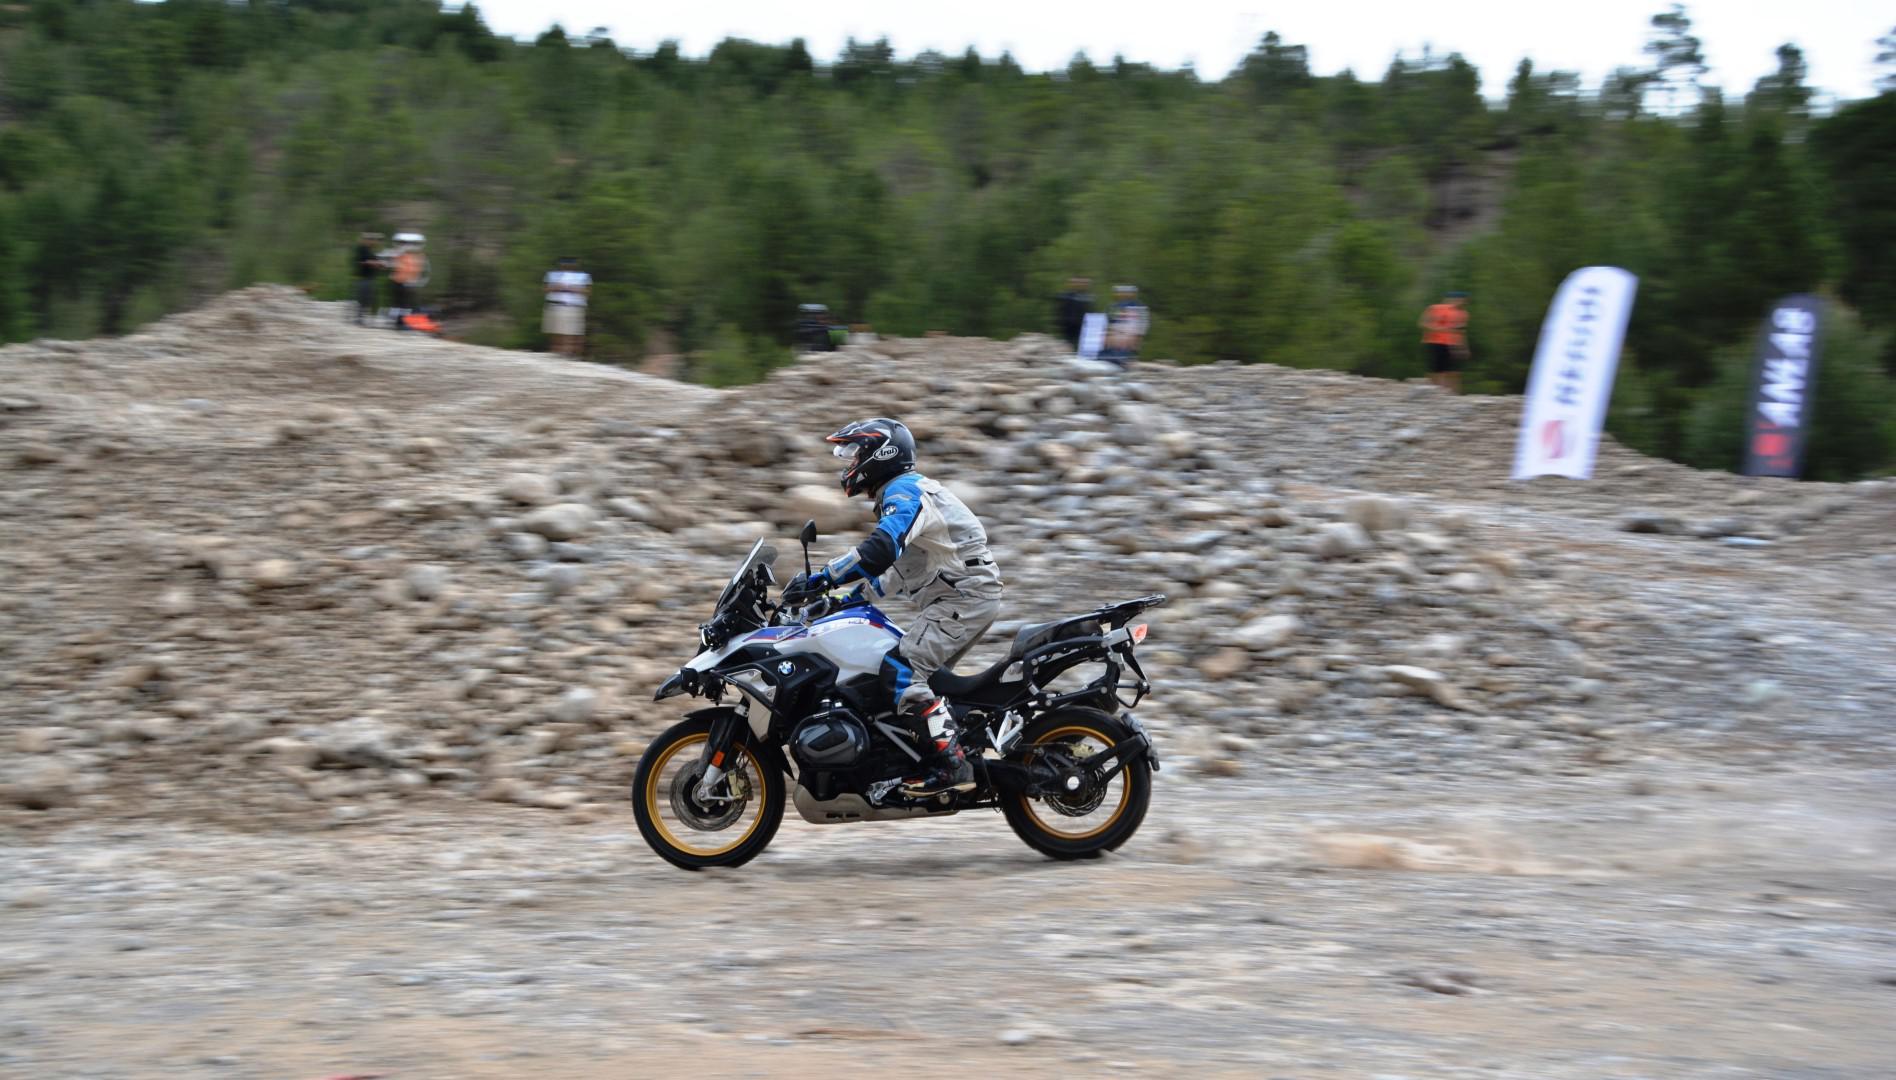 le-morocco-tizi-challenge-est-en-piste-1257-5.jpg